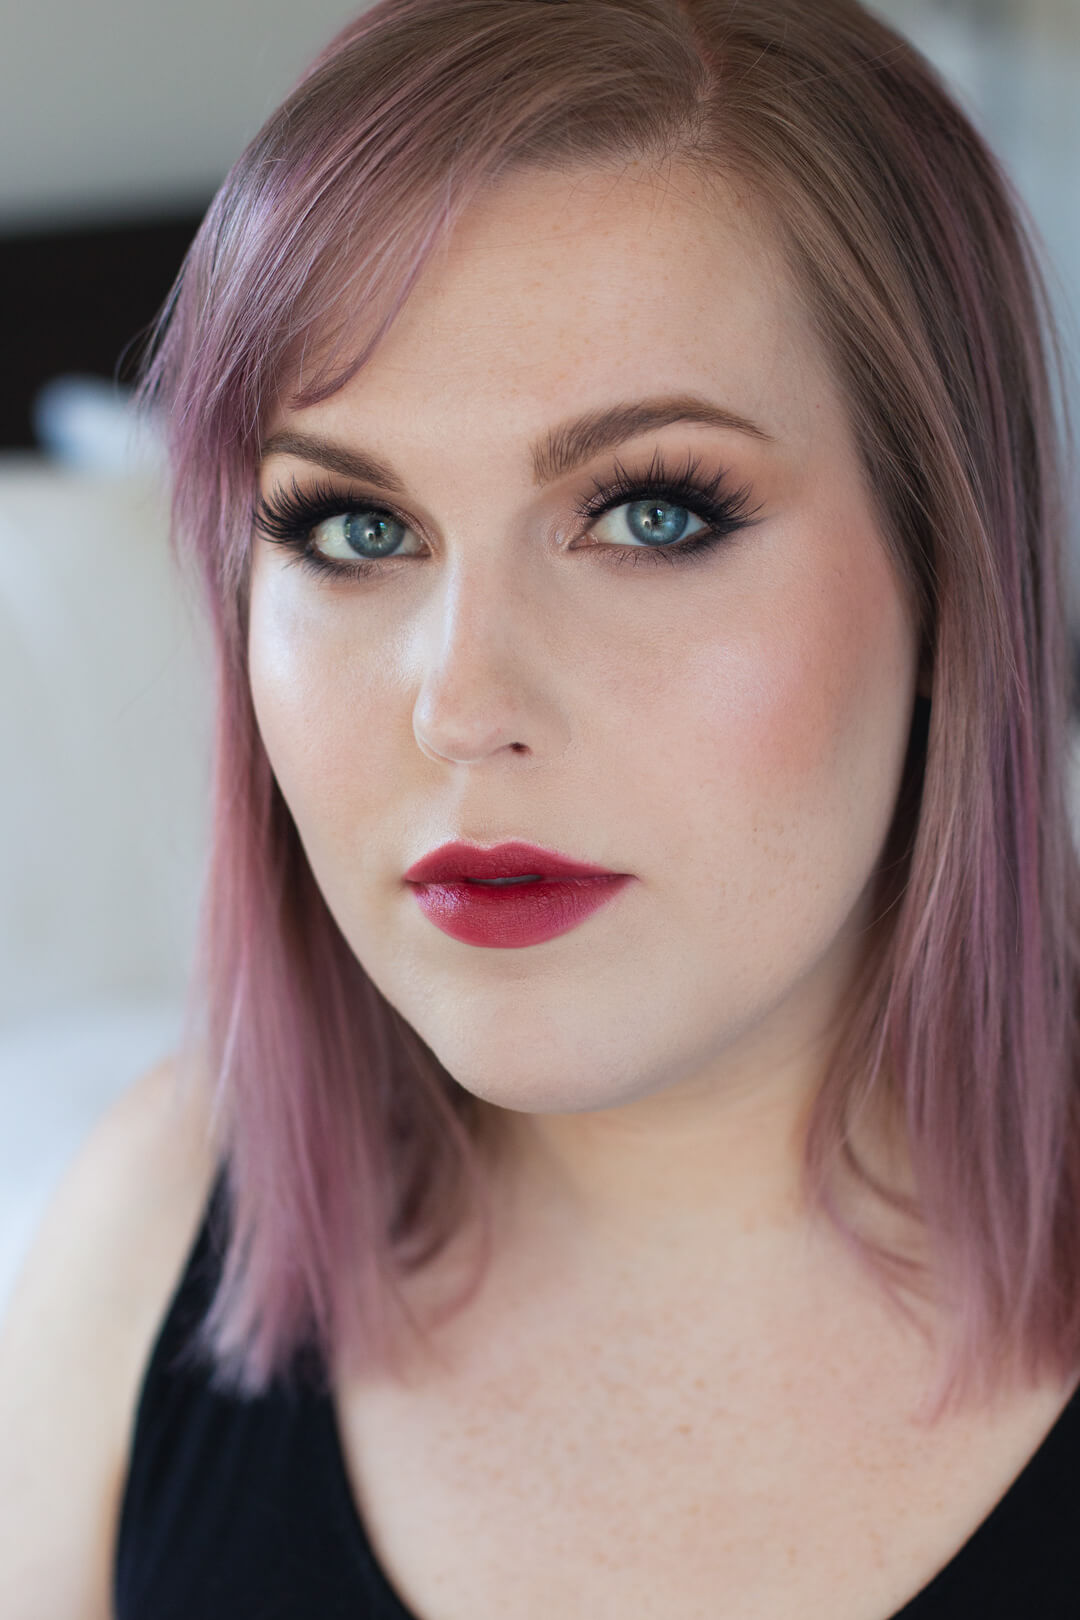 Step-by-Step-Soft-Smoky-Liner-Glamorous-Eye-shadow-Tutorial-final-look-red-lip-lash.jpg